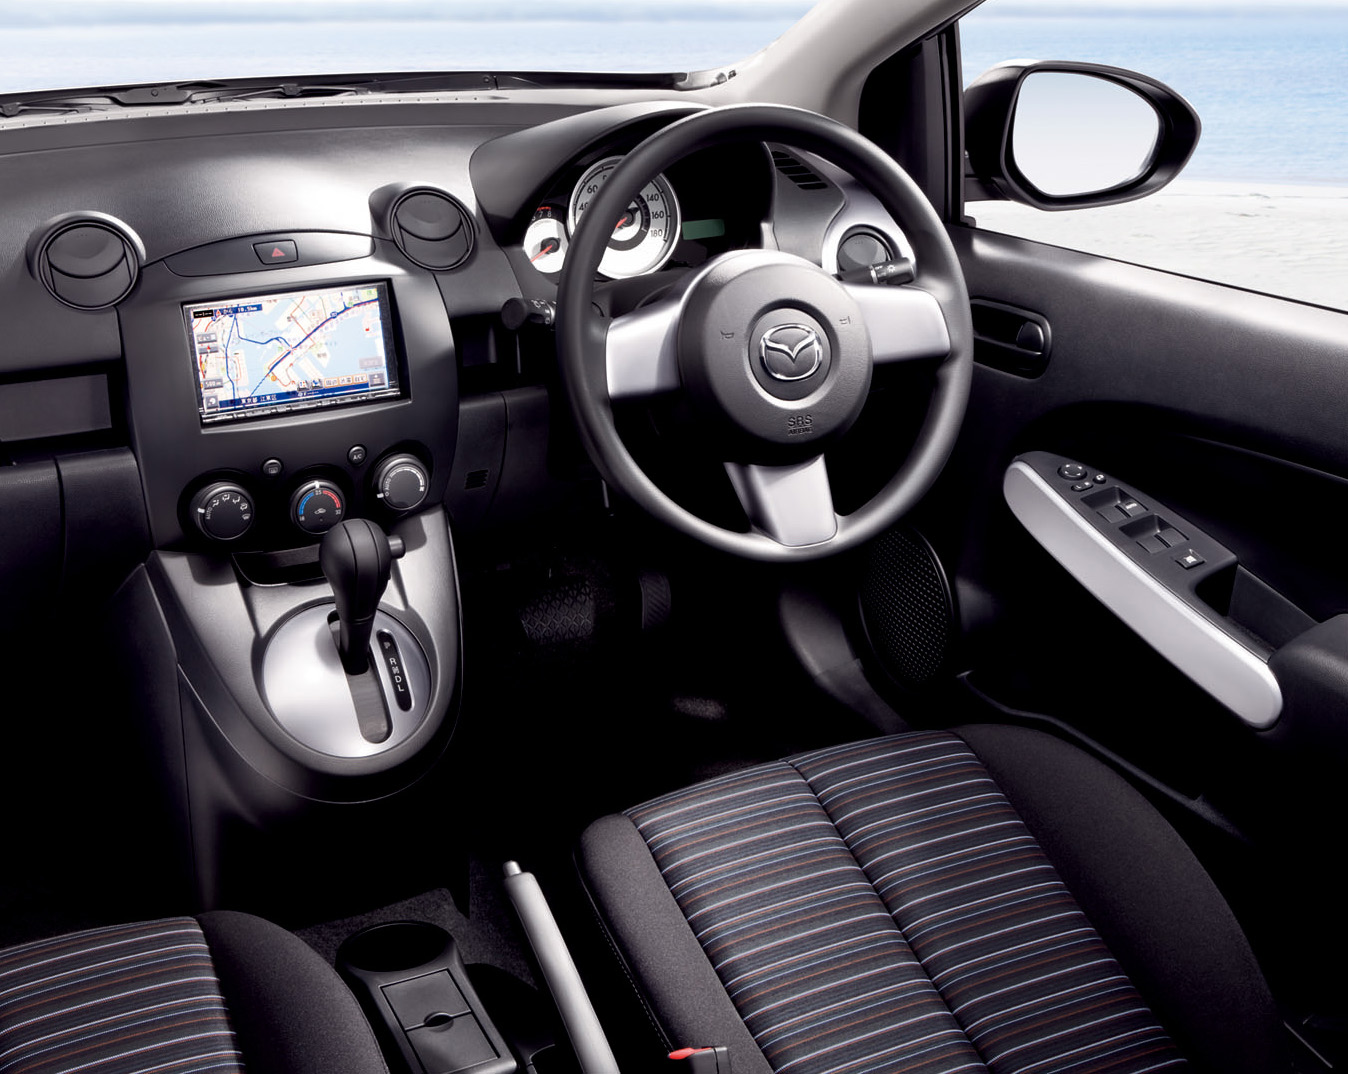 Freshened Mazda Demio Now On Sale In Japan